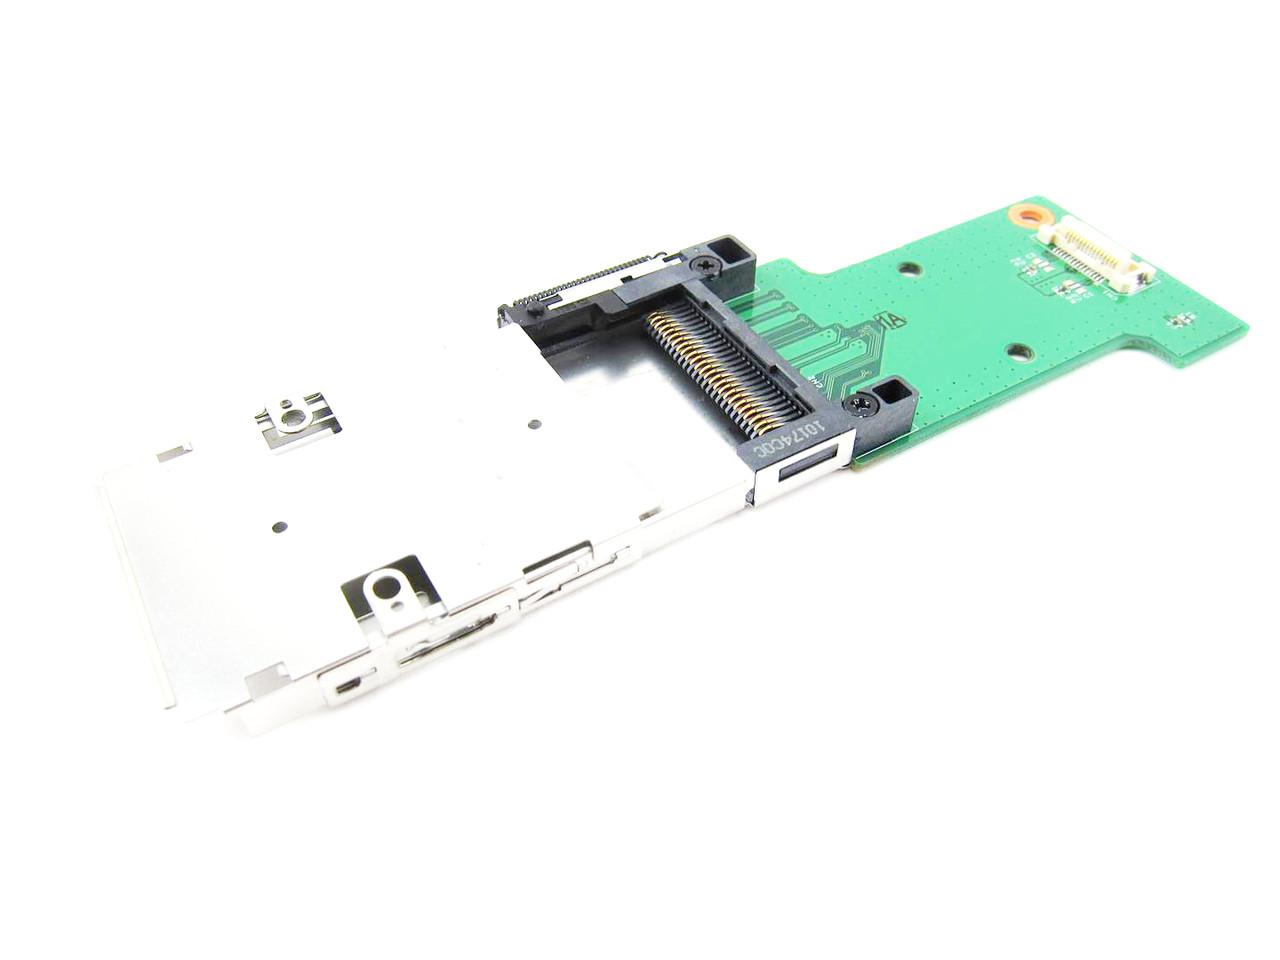 Dell Inspiron 1545 / 1546 Express Card Slot Board - P822F